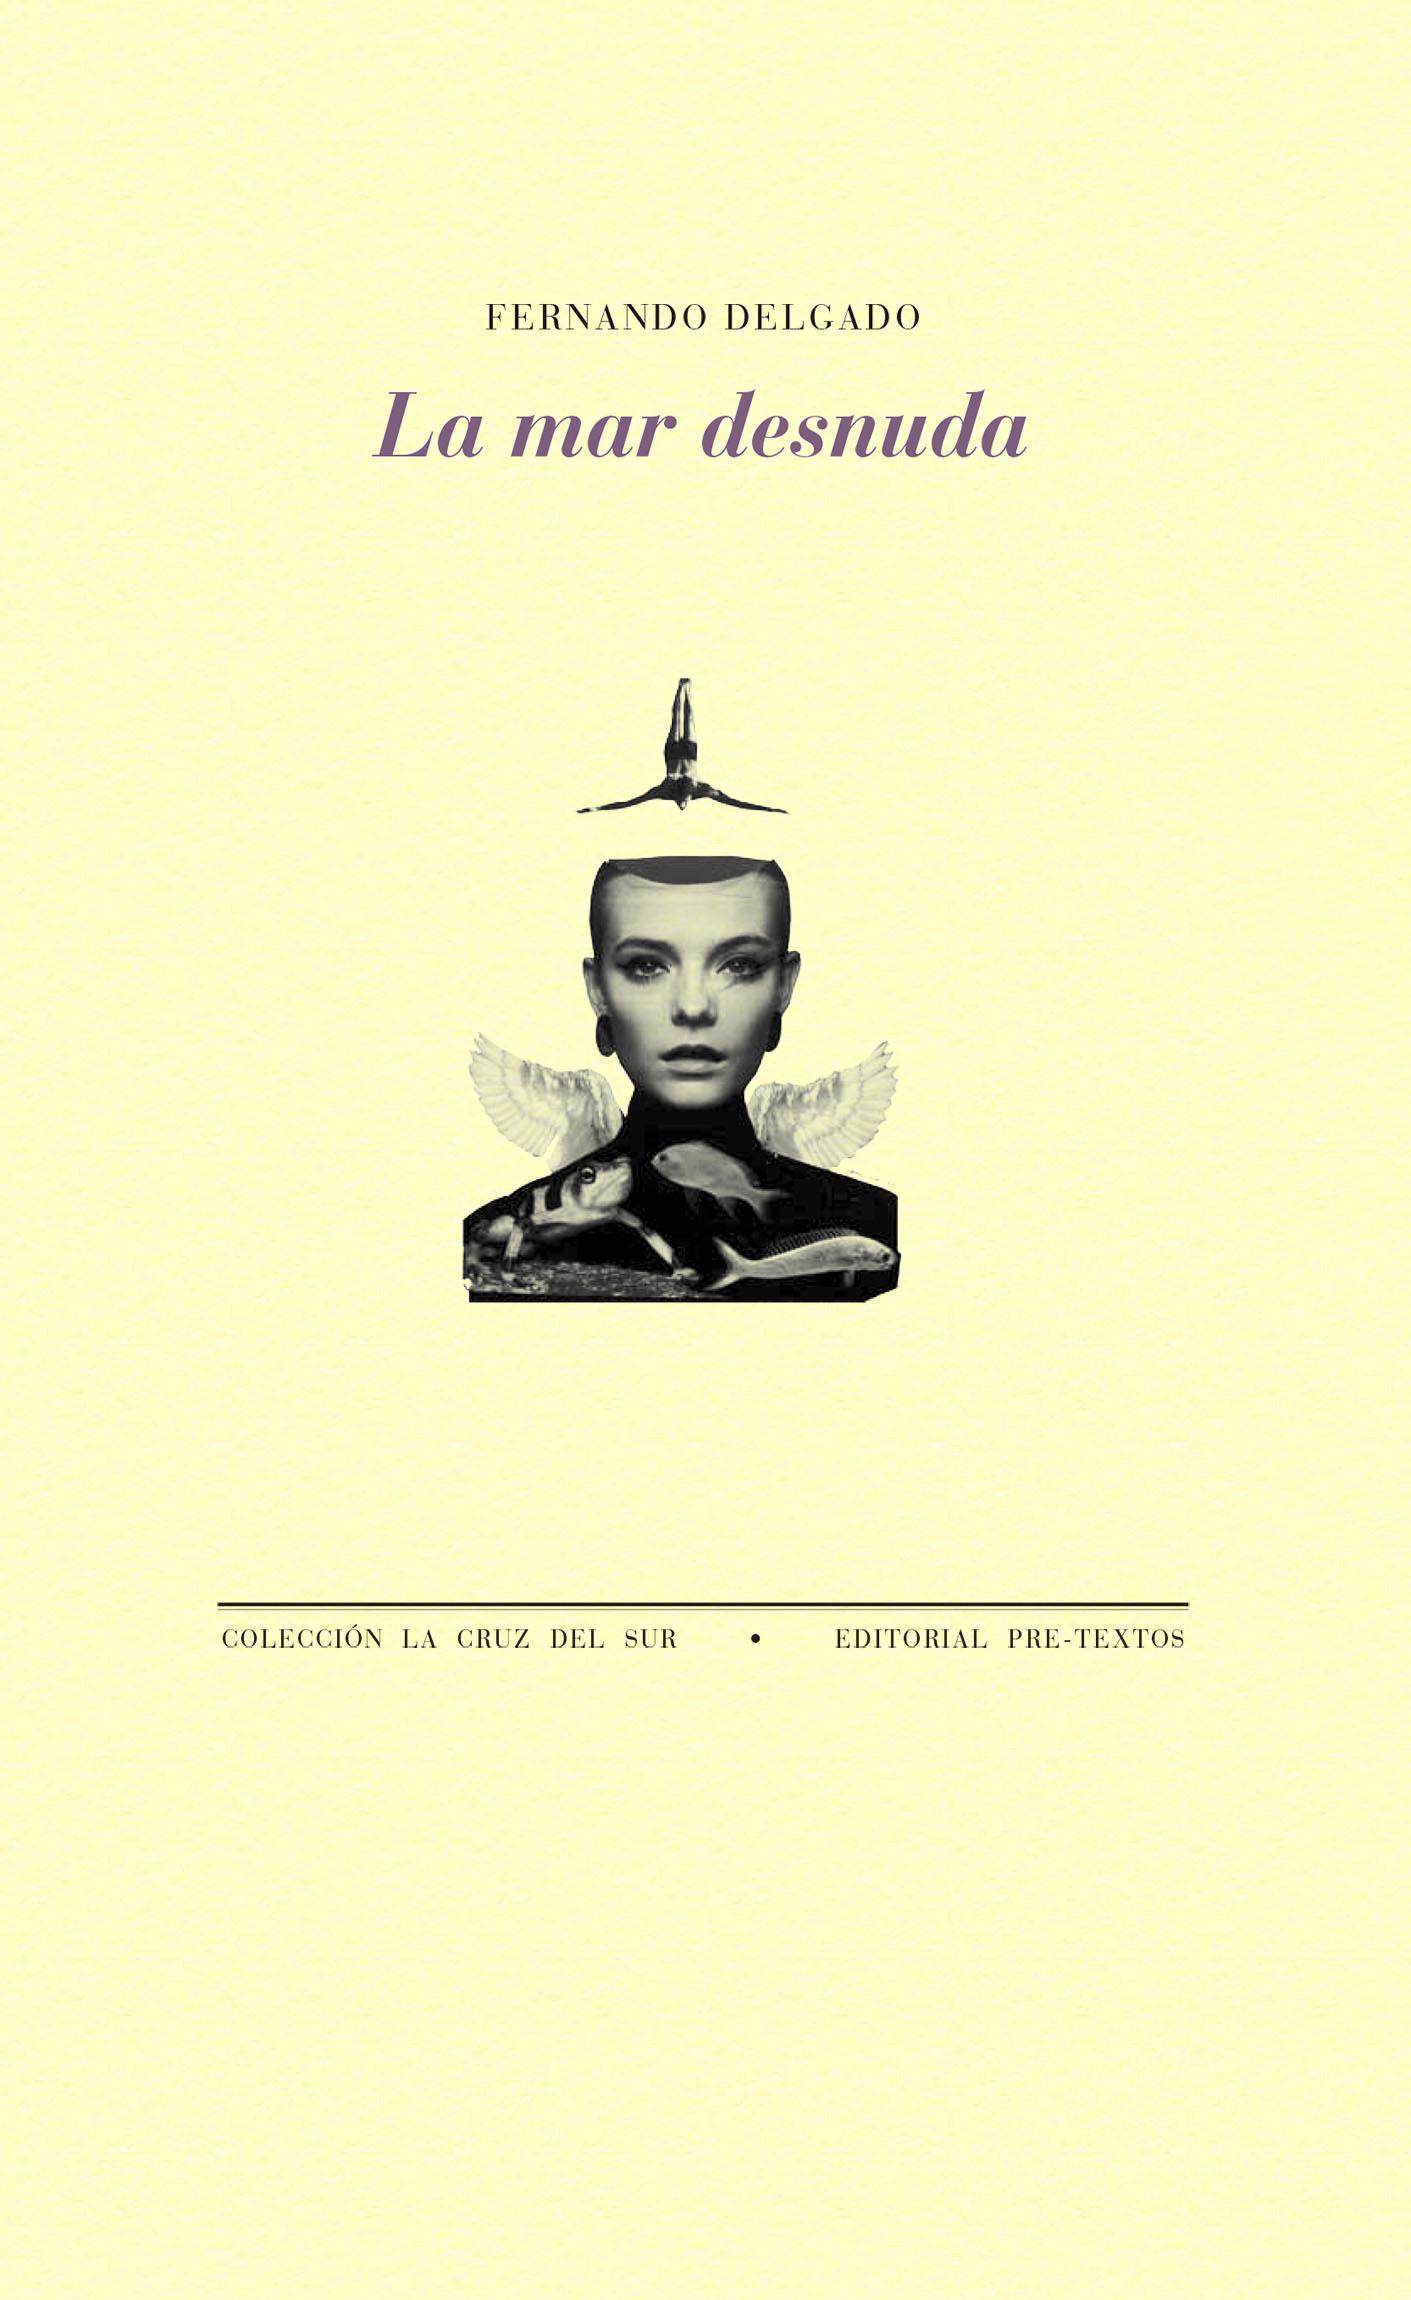 Belen Gimenez Desnuda editorial pre-textos: la mar desnuda